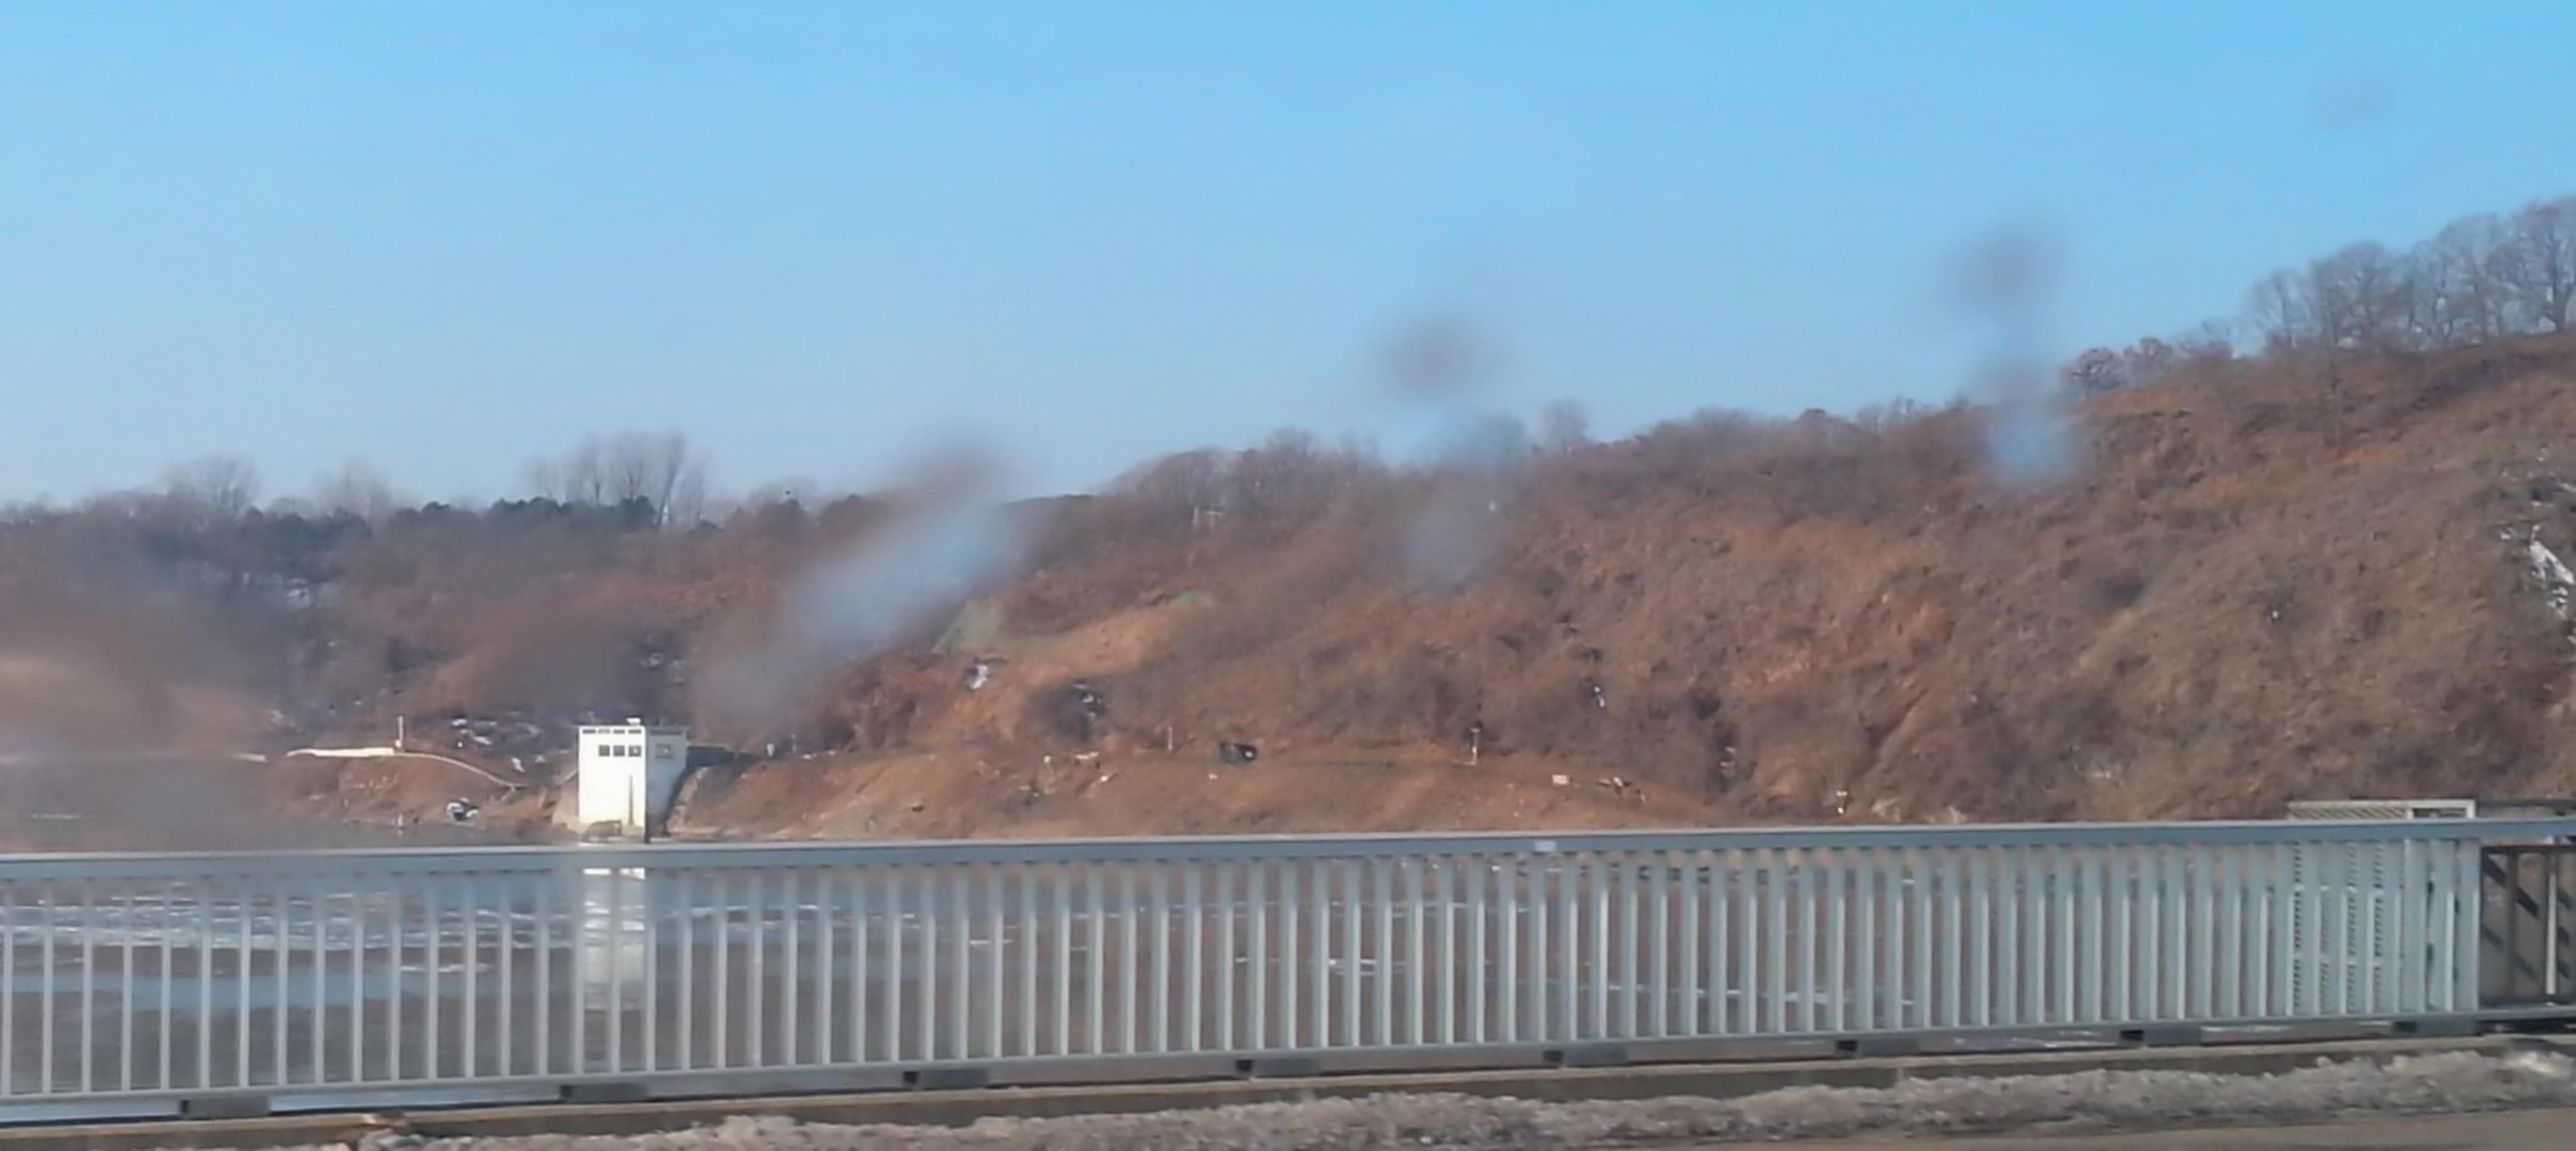 Korea, Seoul, DMZ